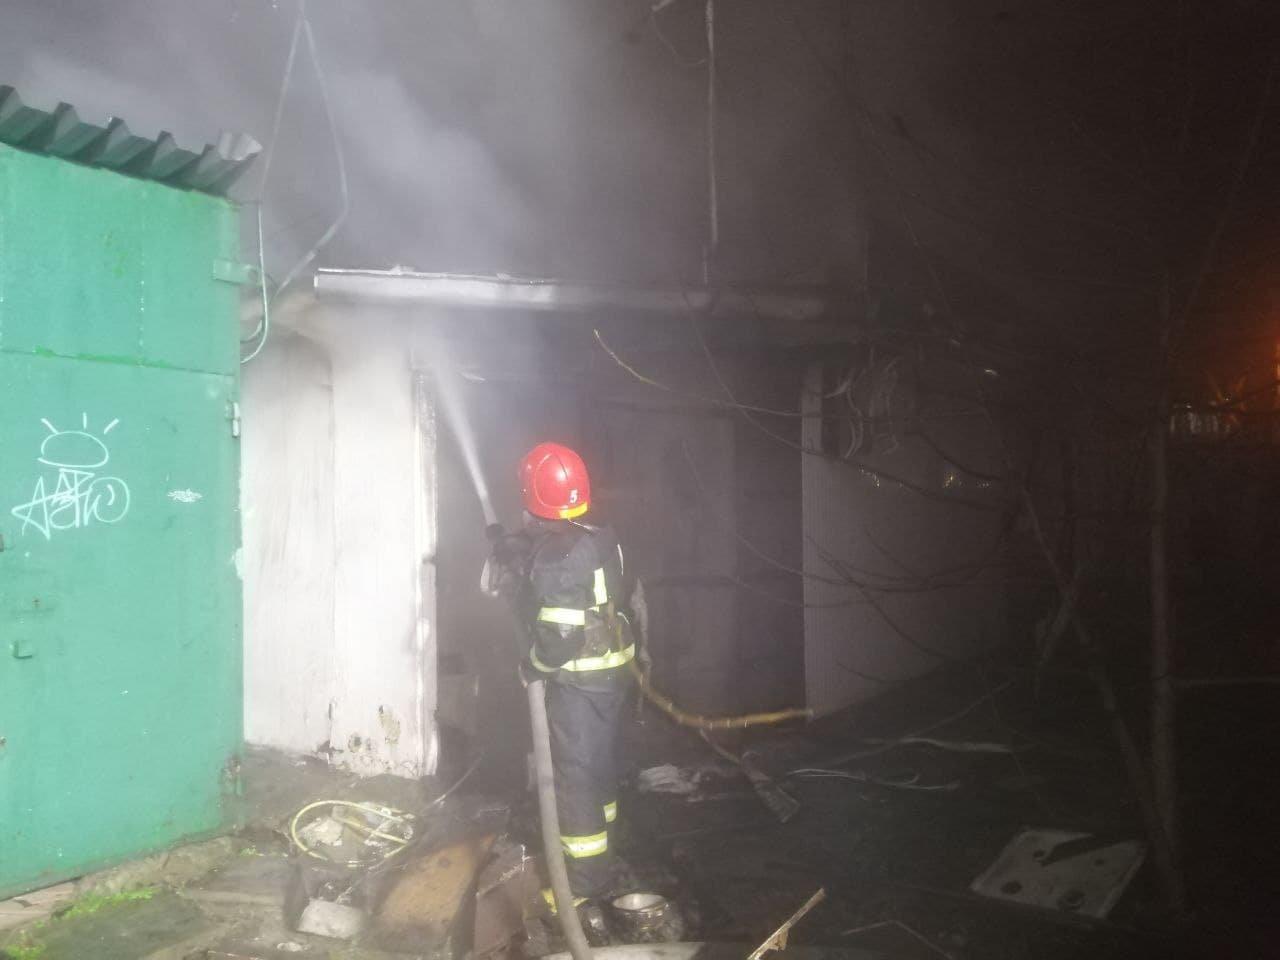 В Одессе во время пожара сгорело 70 кур, - ФОТО, фото-11